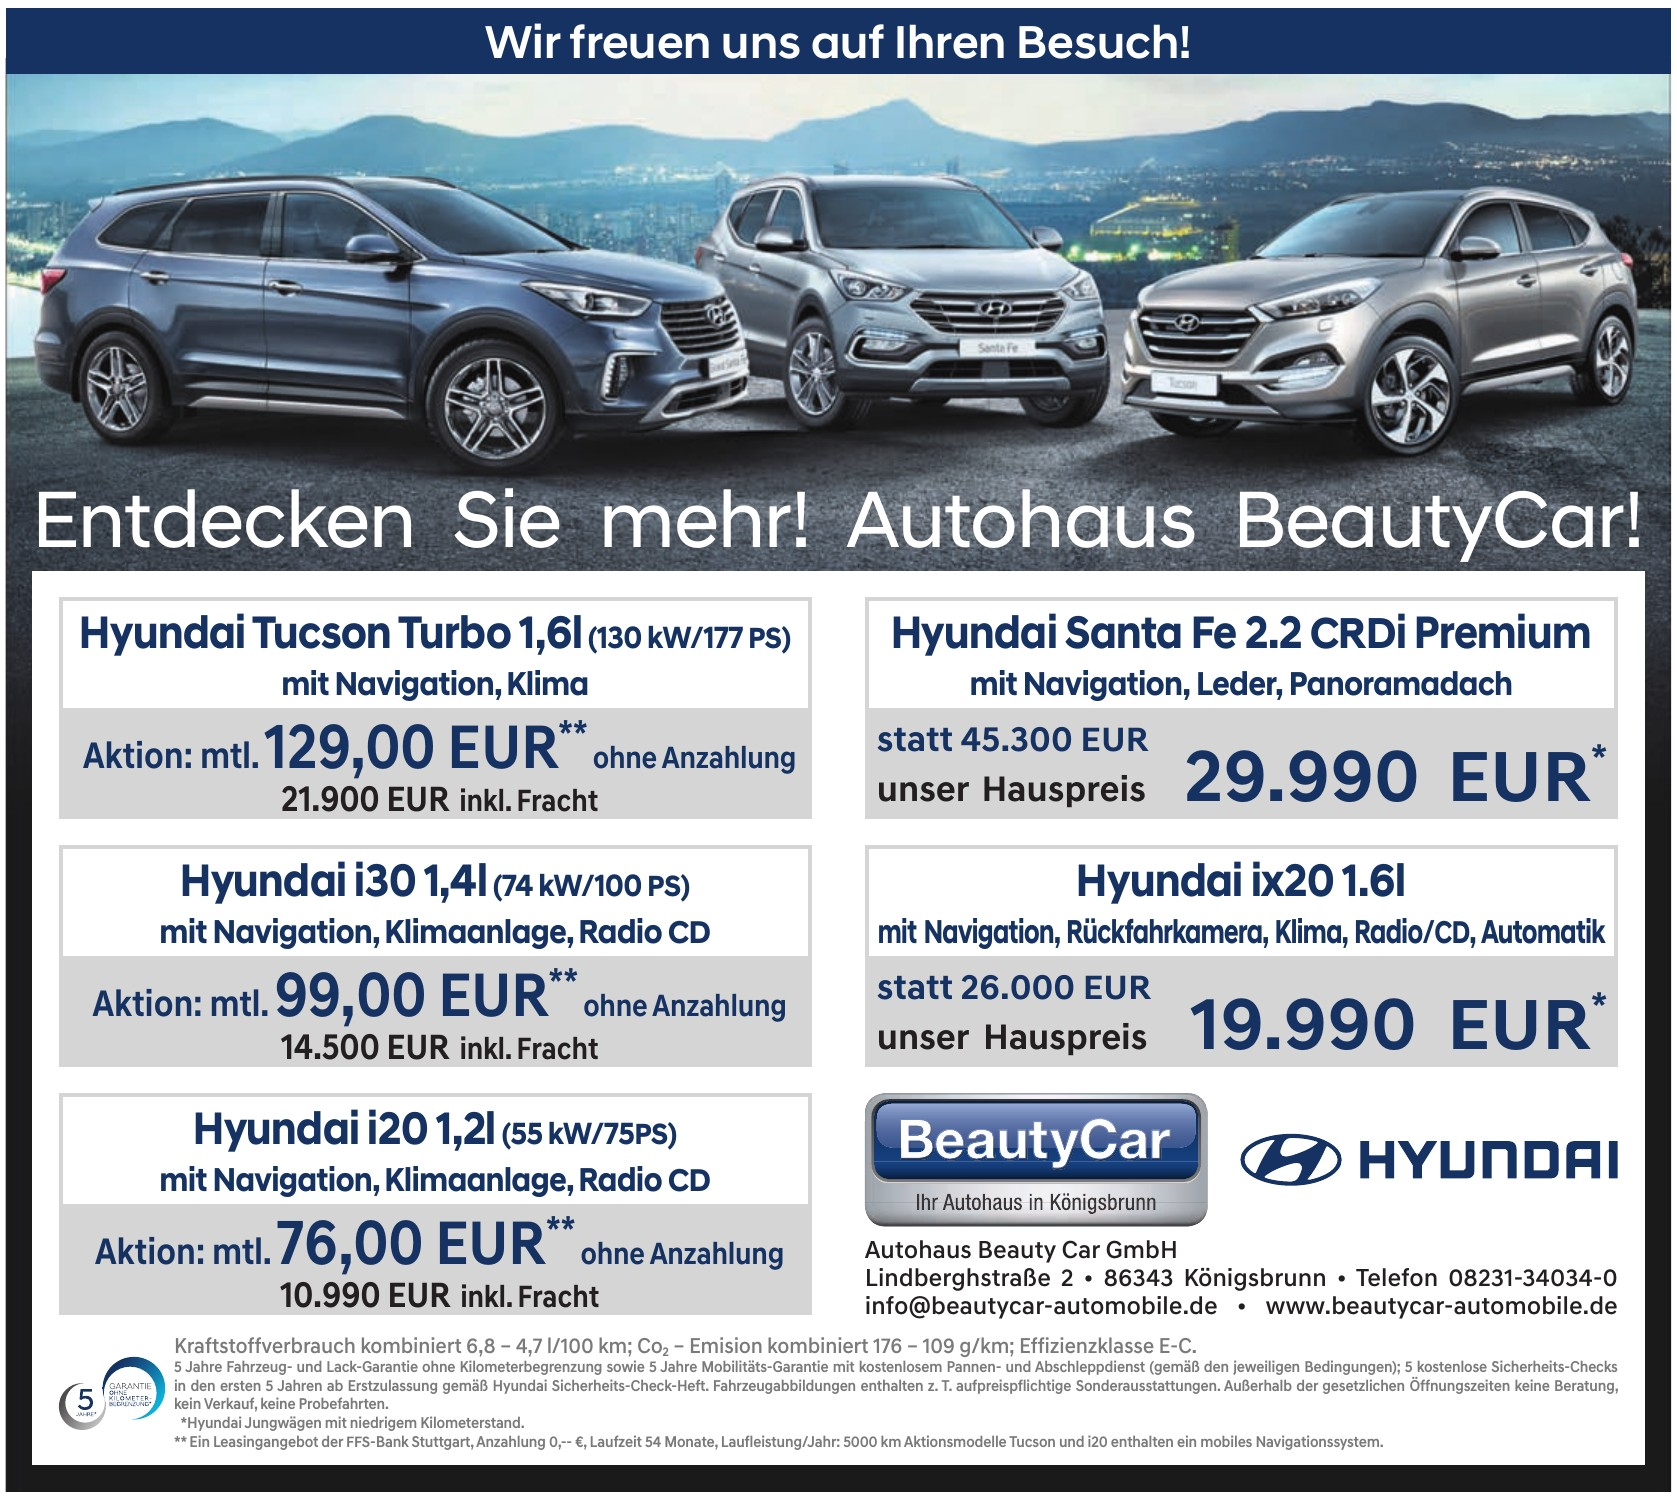 Autohaus Beauty Car GmbH